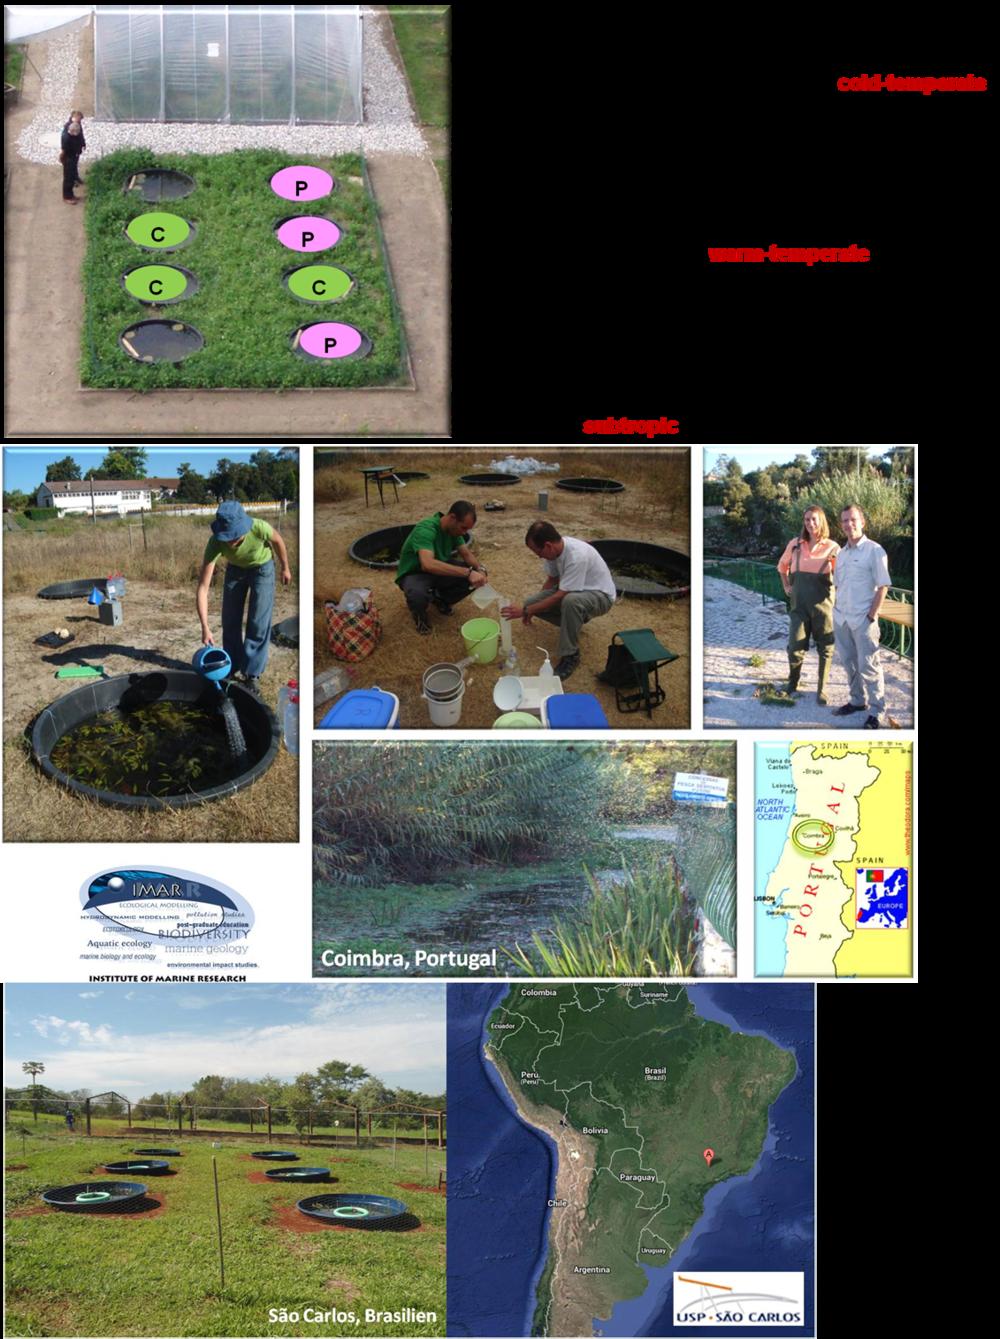 mesocosm facilities in Germany, Portugal & Brazil